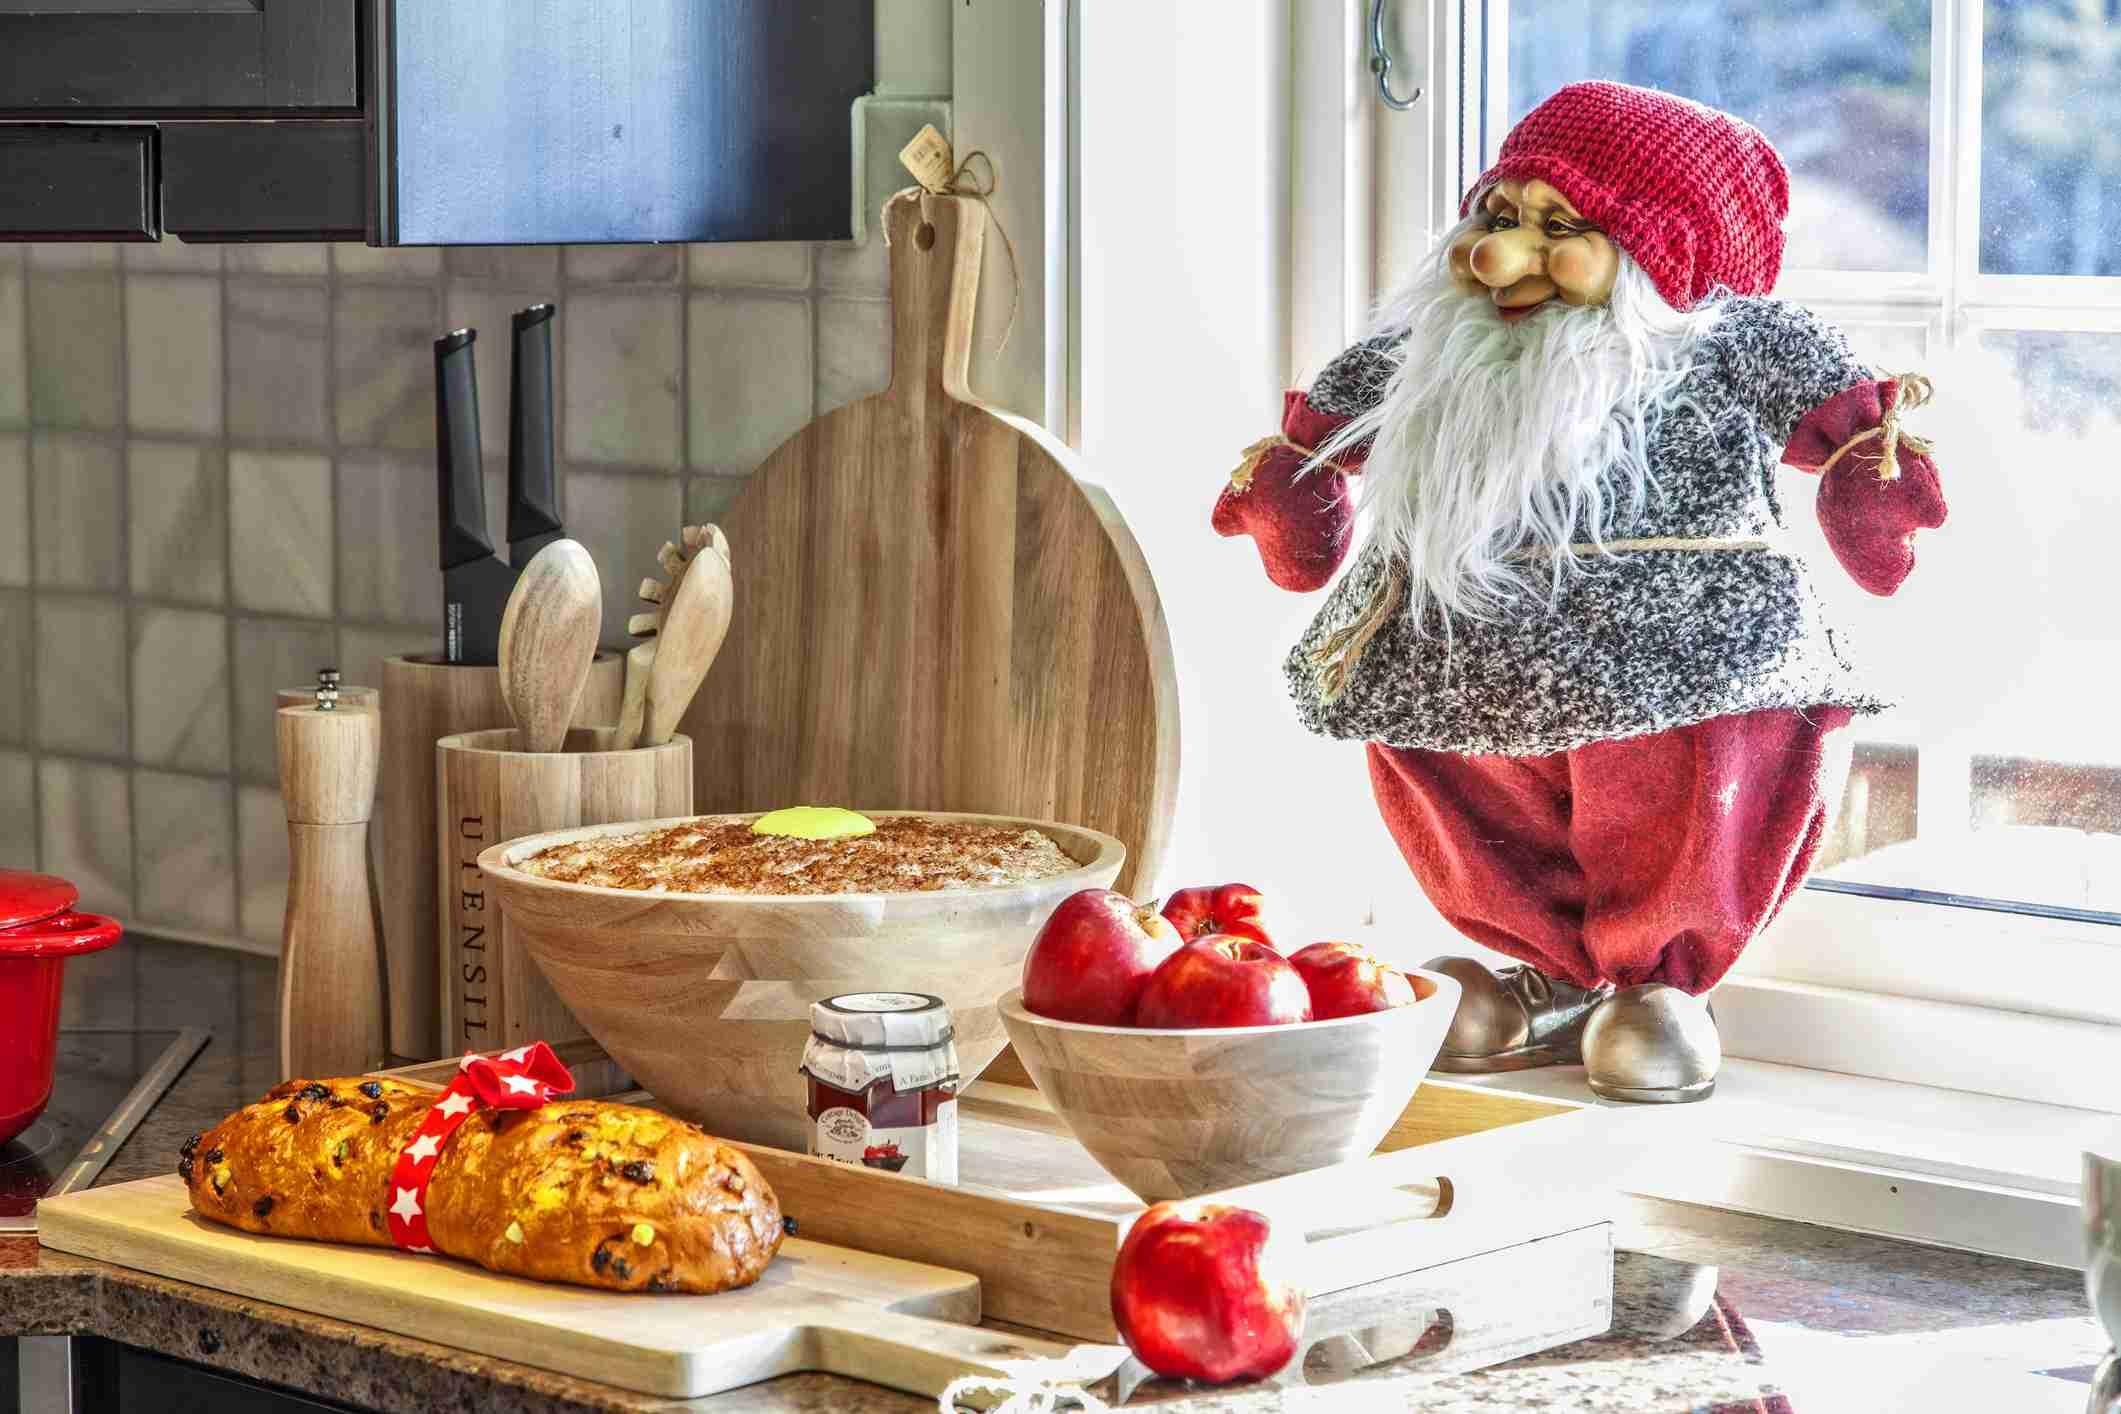 Julekake Norwegian Christmas Bread Recipe